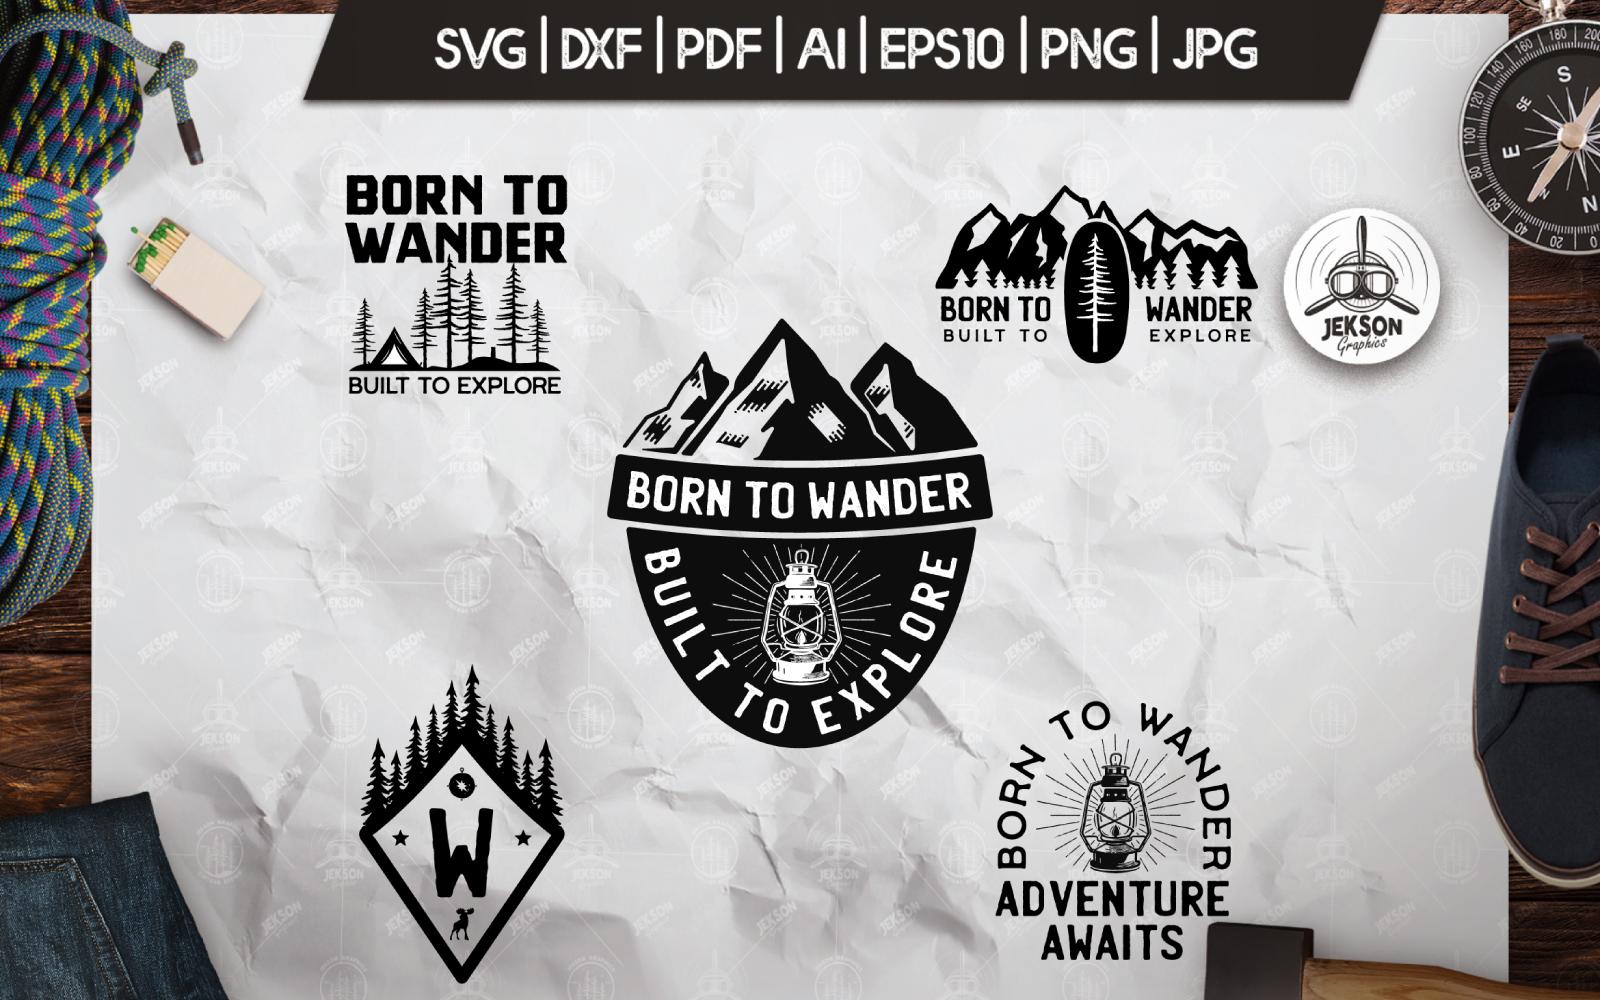 Wanderlust, Retro Vector Camping Badges, Shirt SVG Cut Template de Logotipo №156455